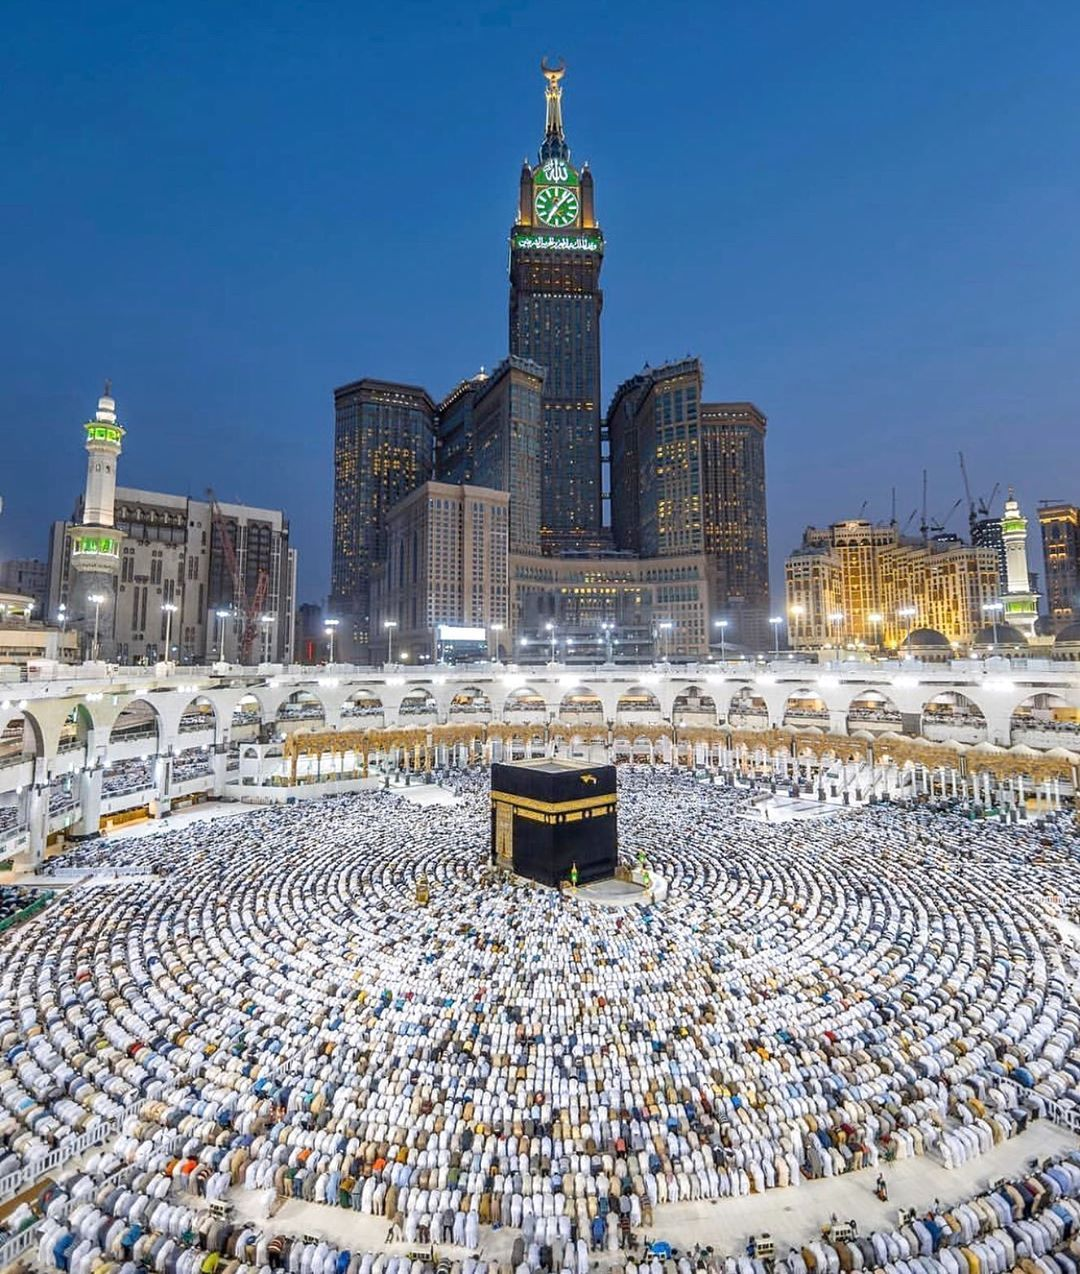 Makkah Madinah Mekah Pemandangan Gambar Kota